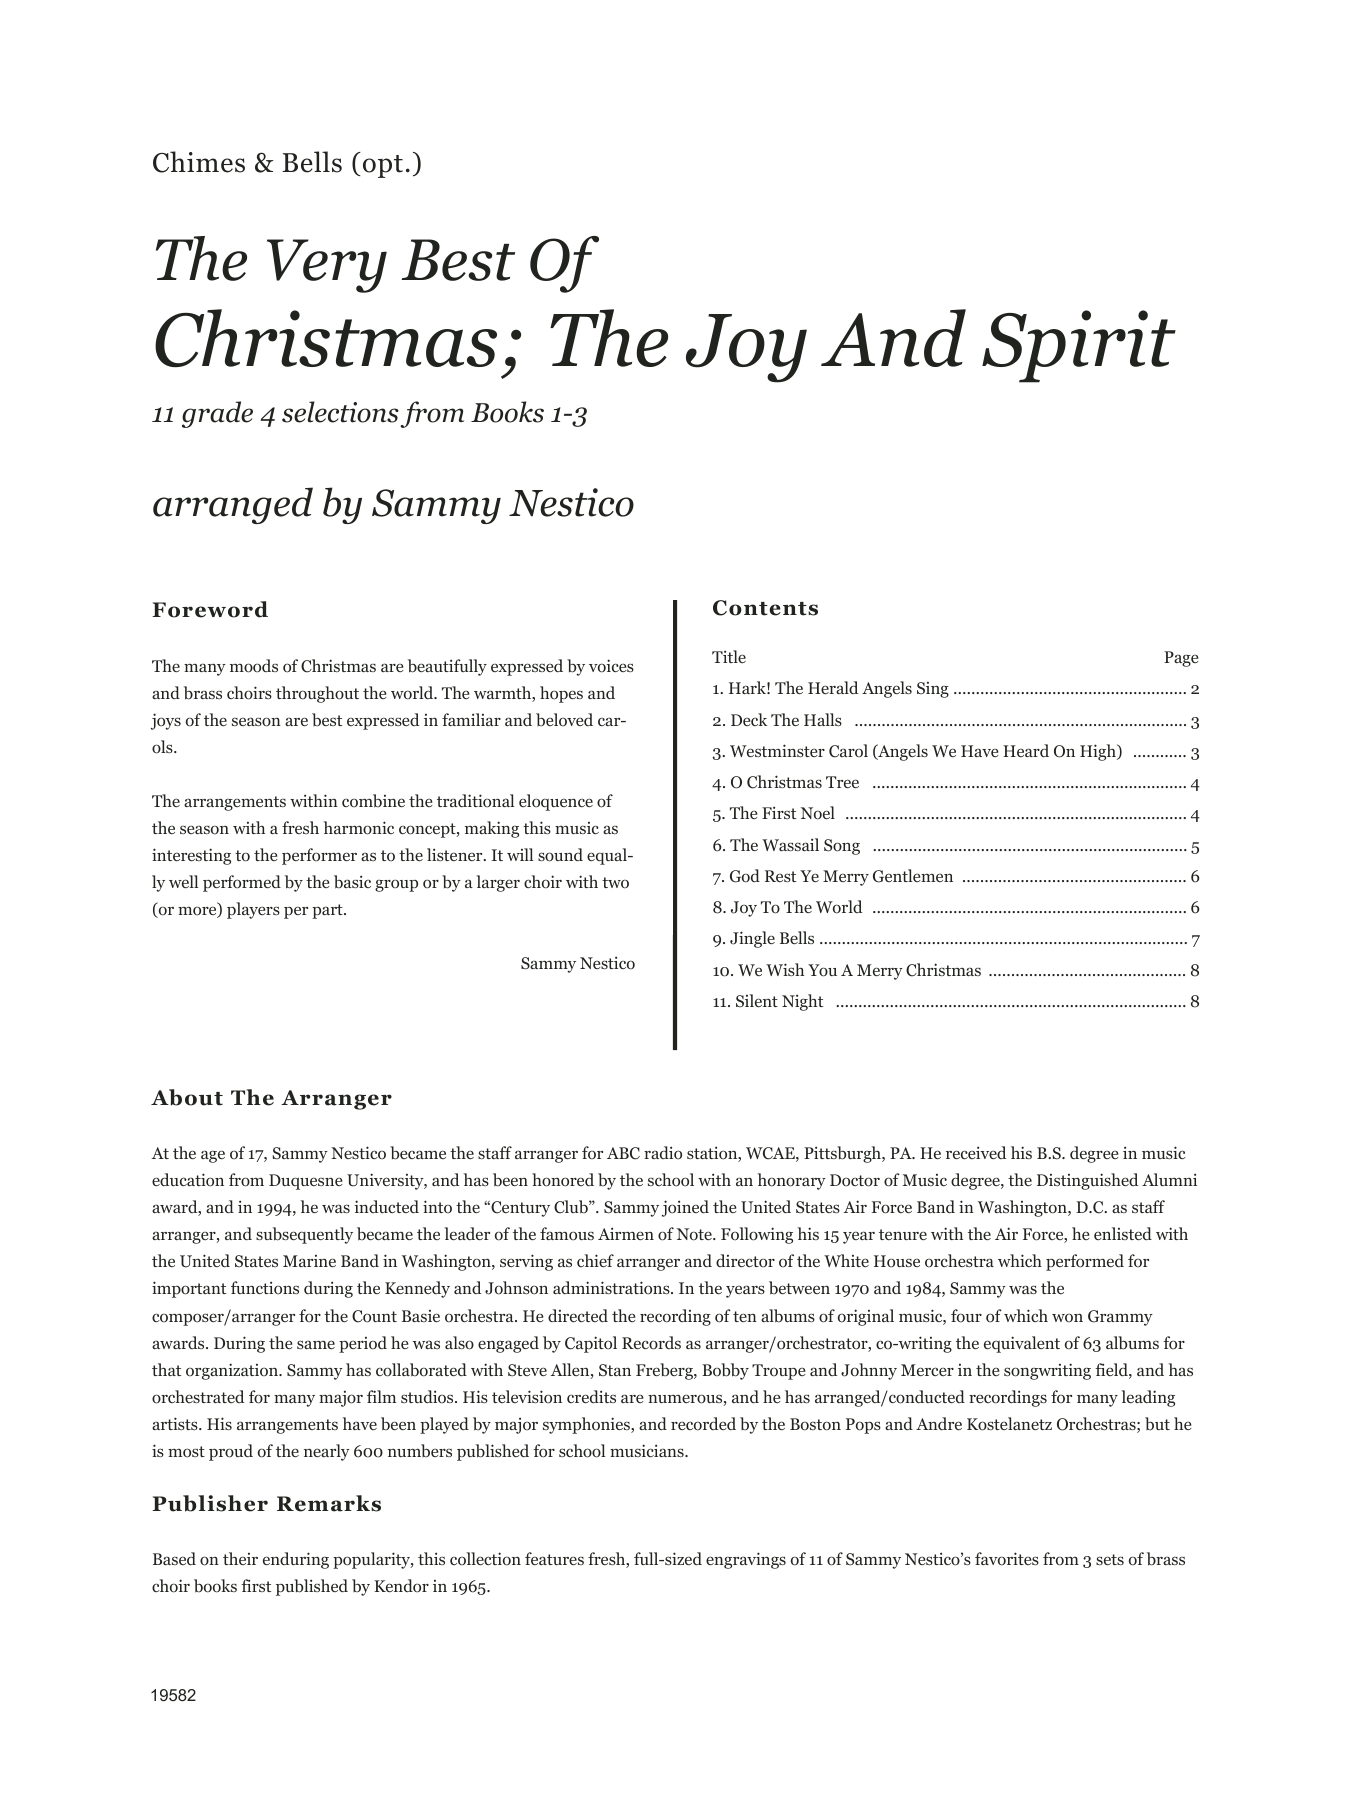 Very Best Of Christmas; The Joy And Spirit (Books 1-3) - Bells Sheet Music